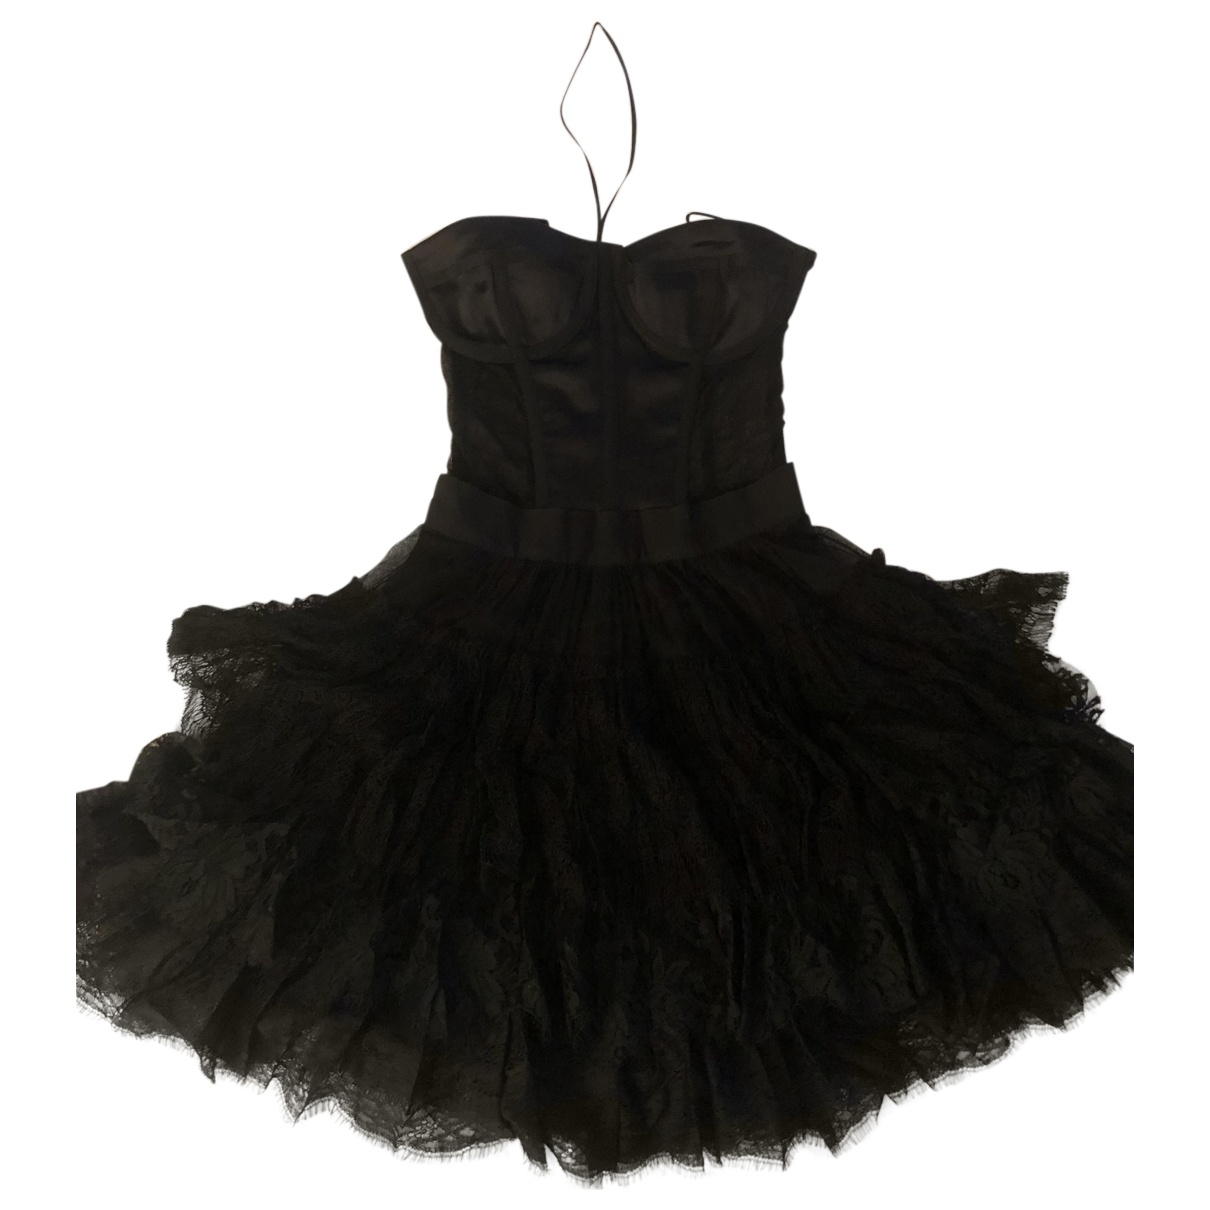 Dolce & Gabbana \N Black Cotton - elasthane dress for Women 40 IT